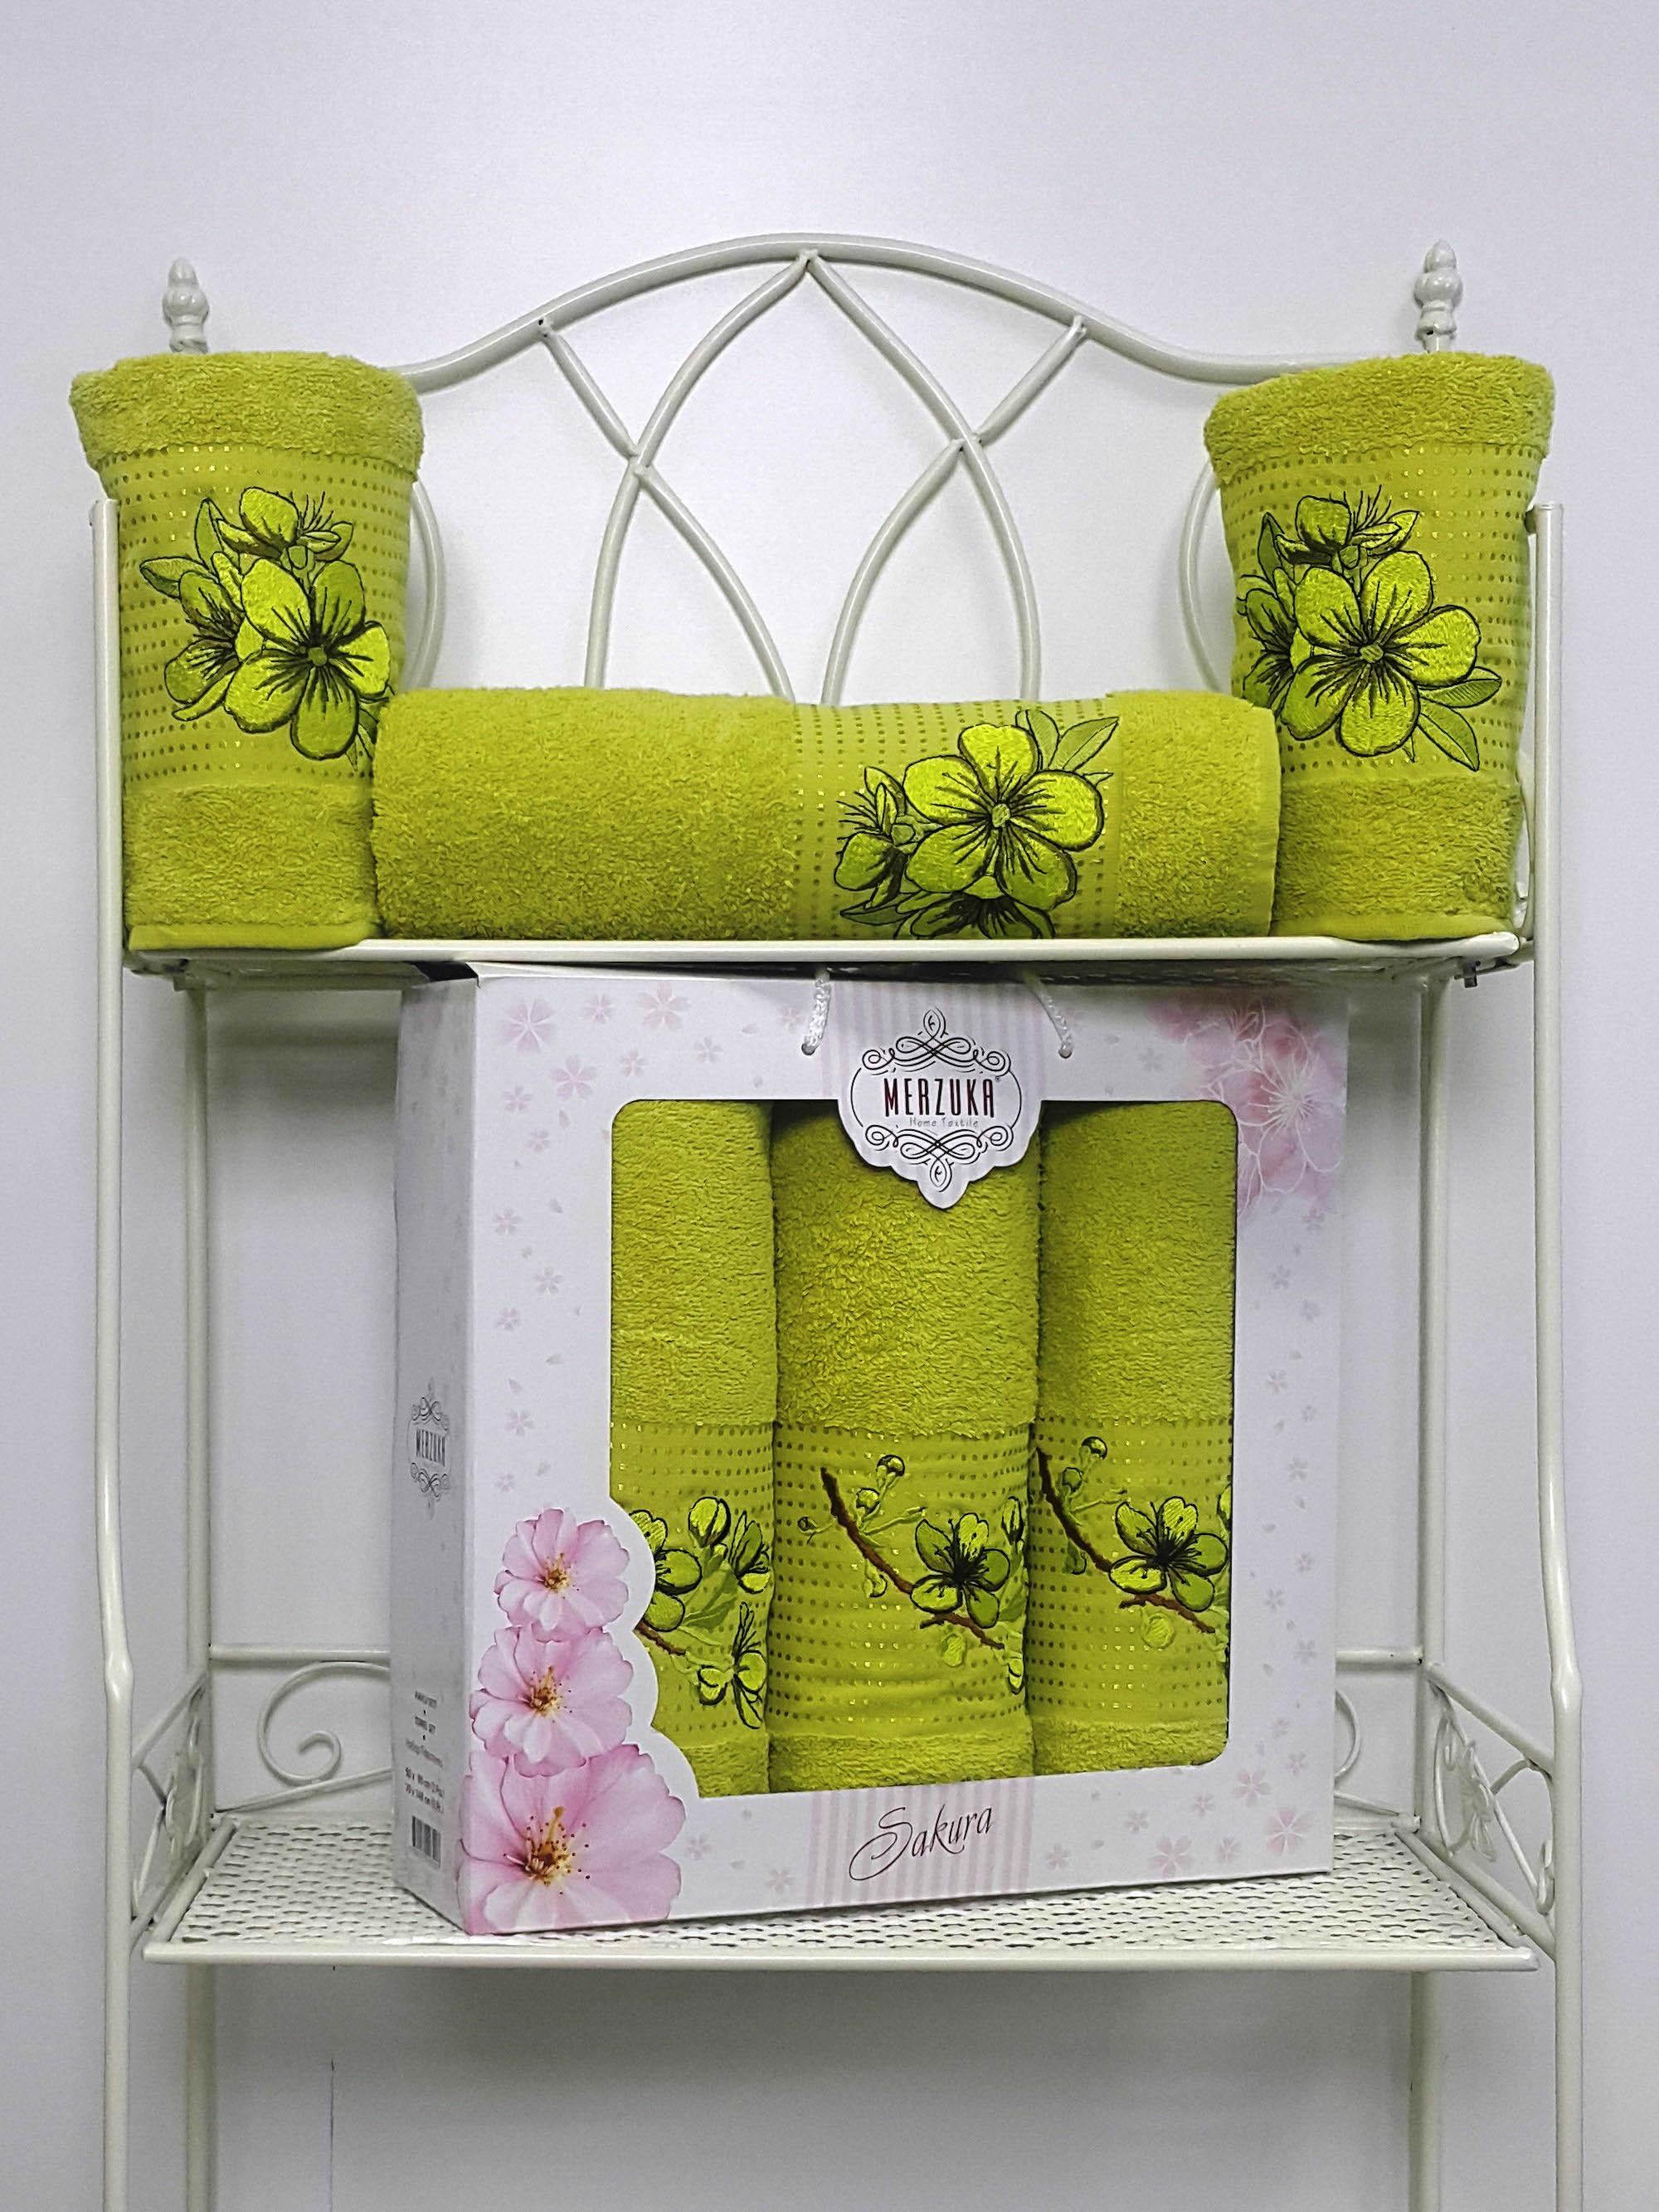 Полотенца Oran Merzuka Набор из 3 полотенец Sakura Цвет: Зелёный набор из 3 полотенец merzuka sakura 50х90 2 70х140 8432 розовый